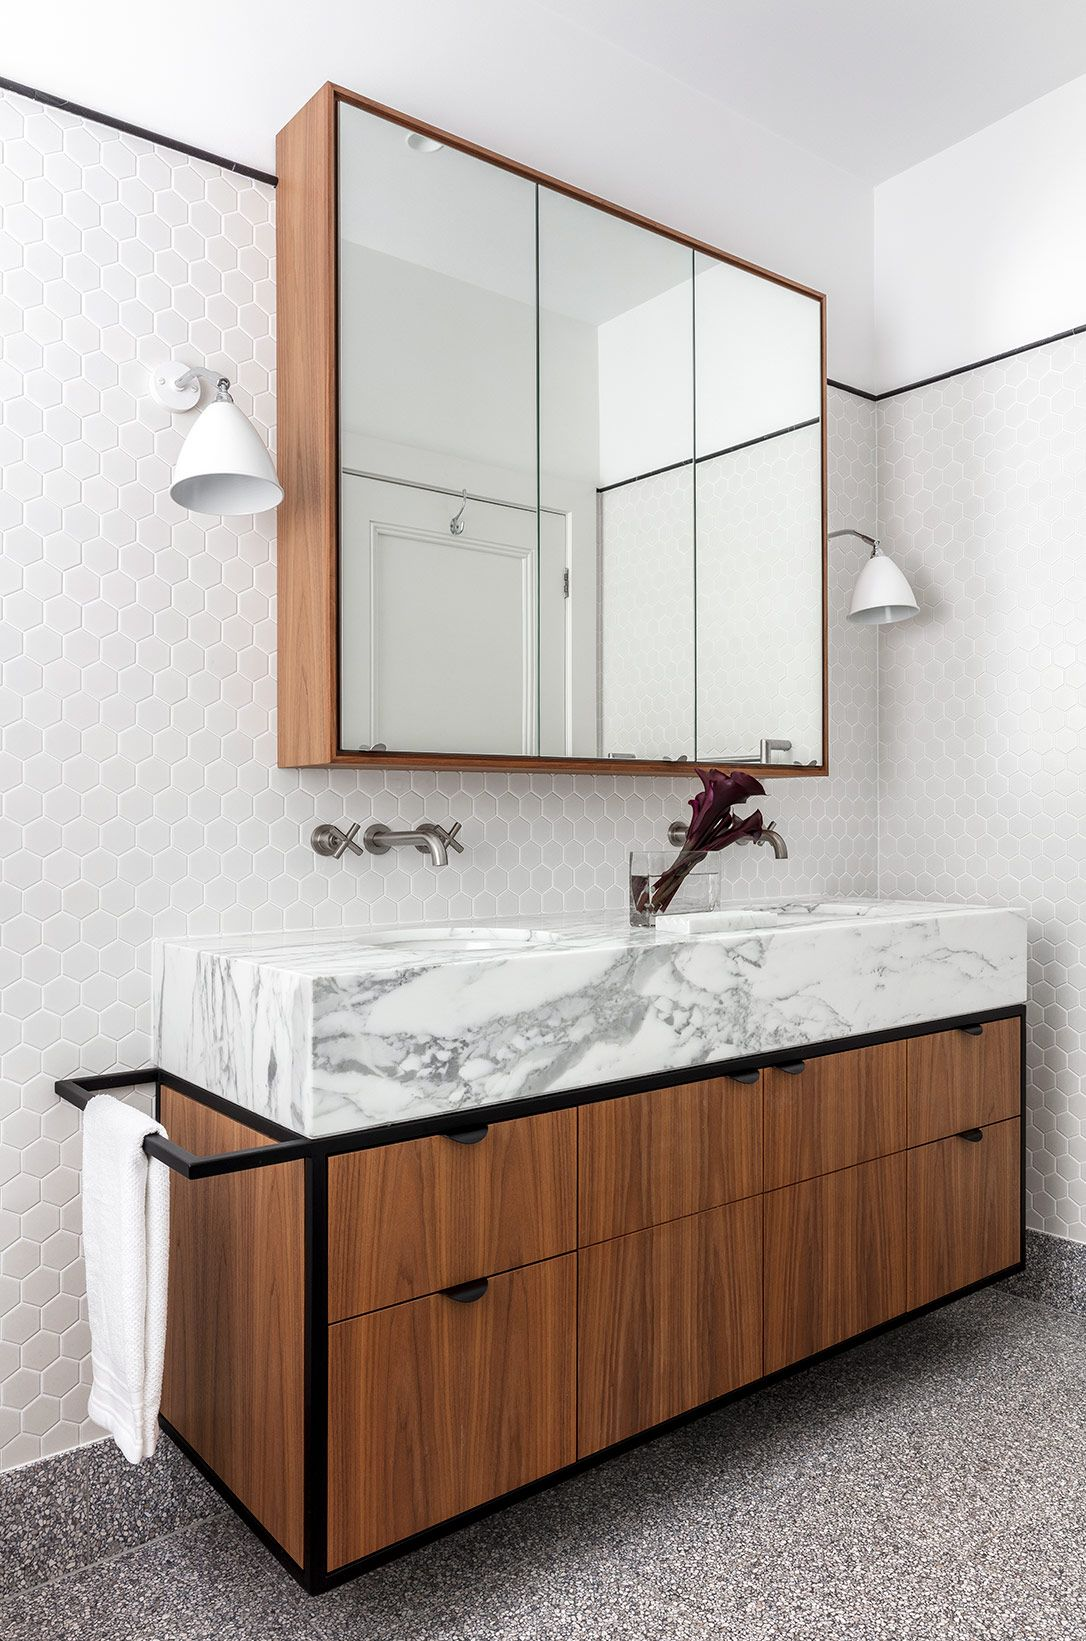 17 DIY Vanity Mirror Ideas to Make Your Room More Beautiful ...